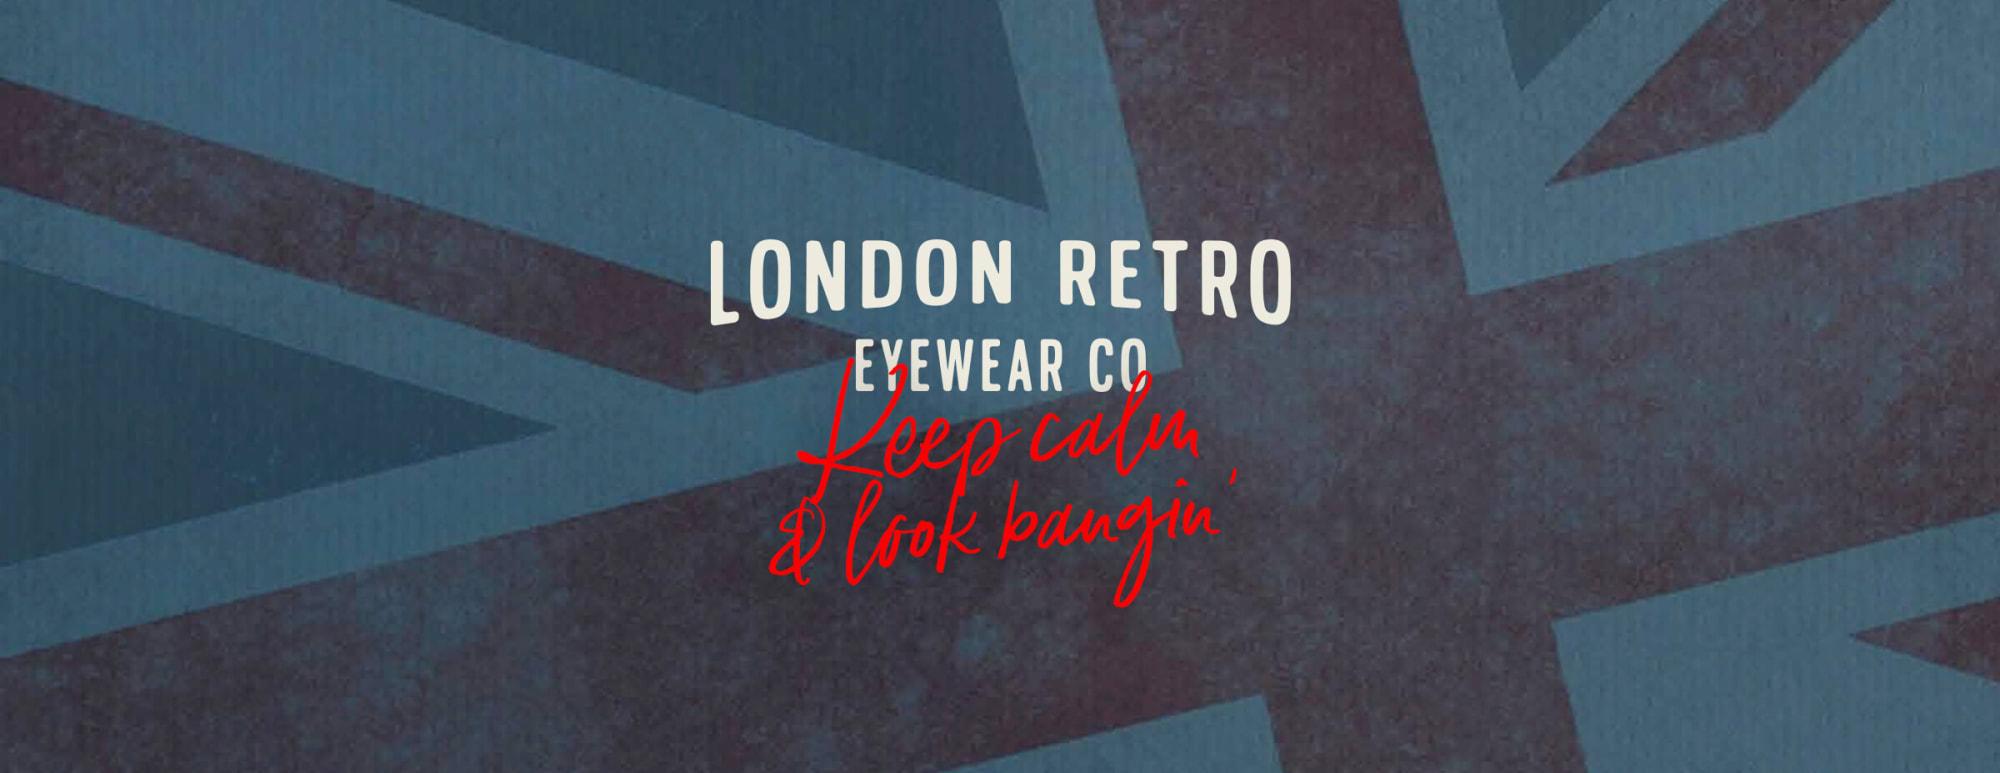 London Retro